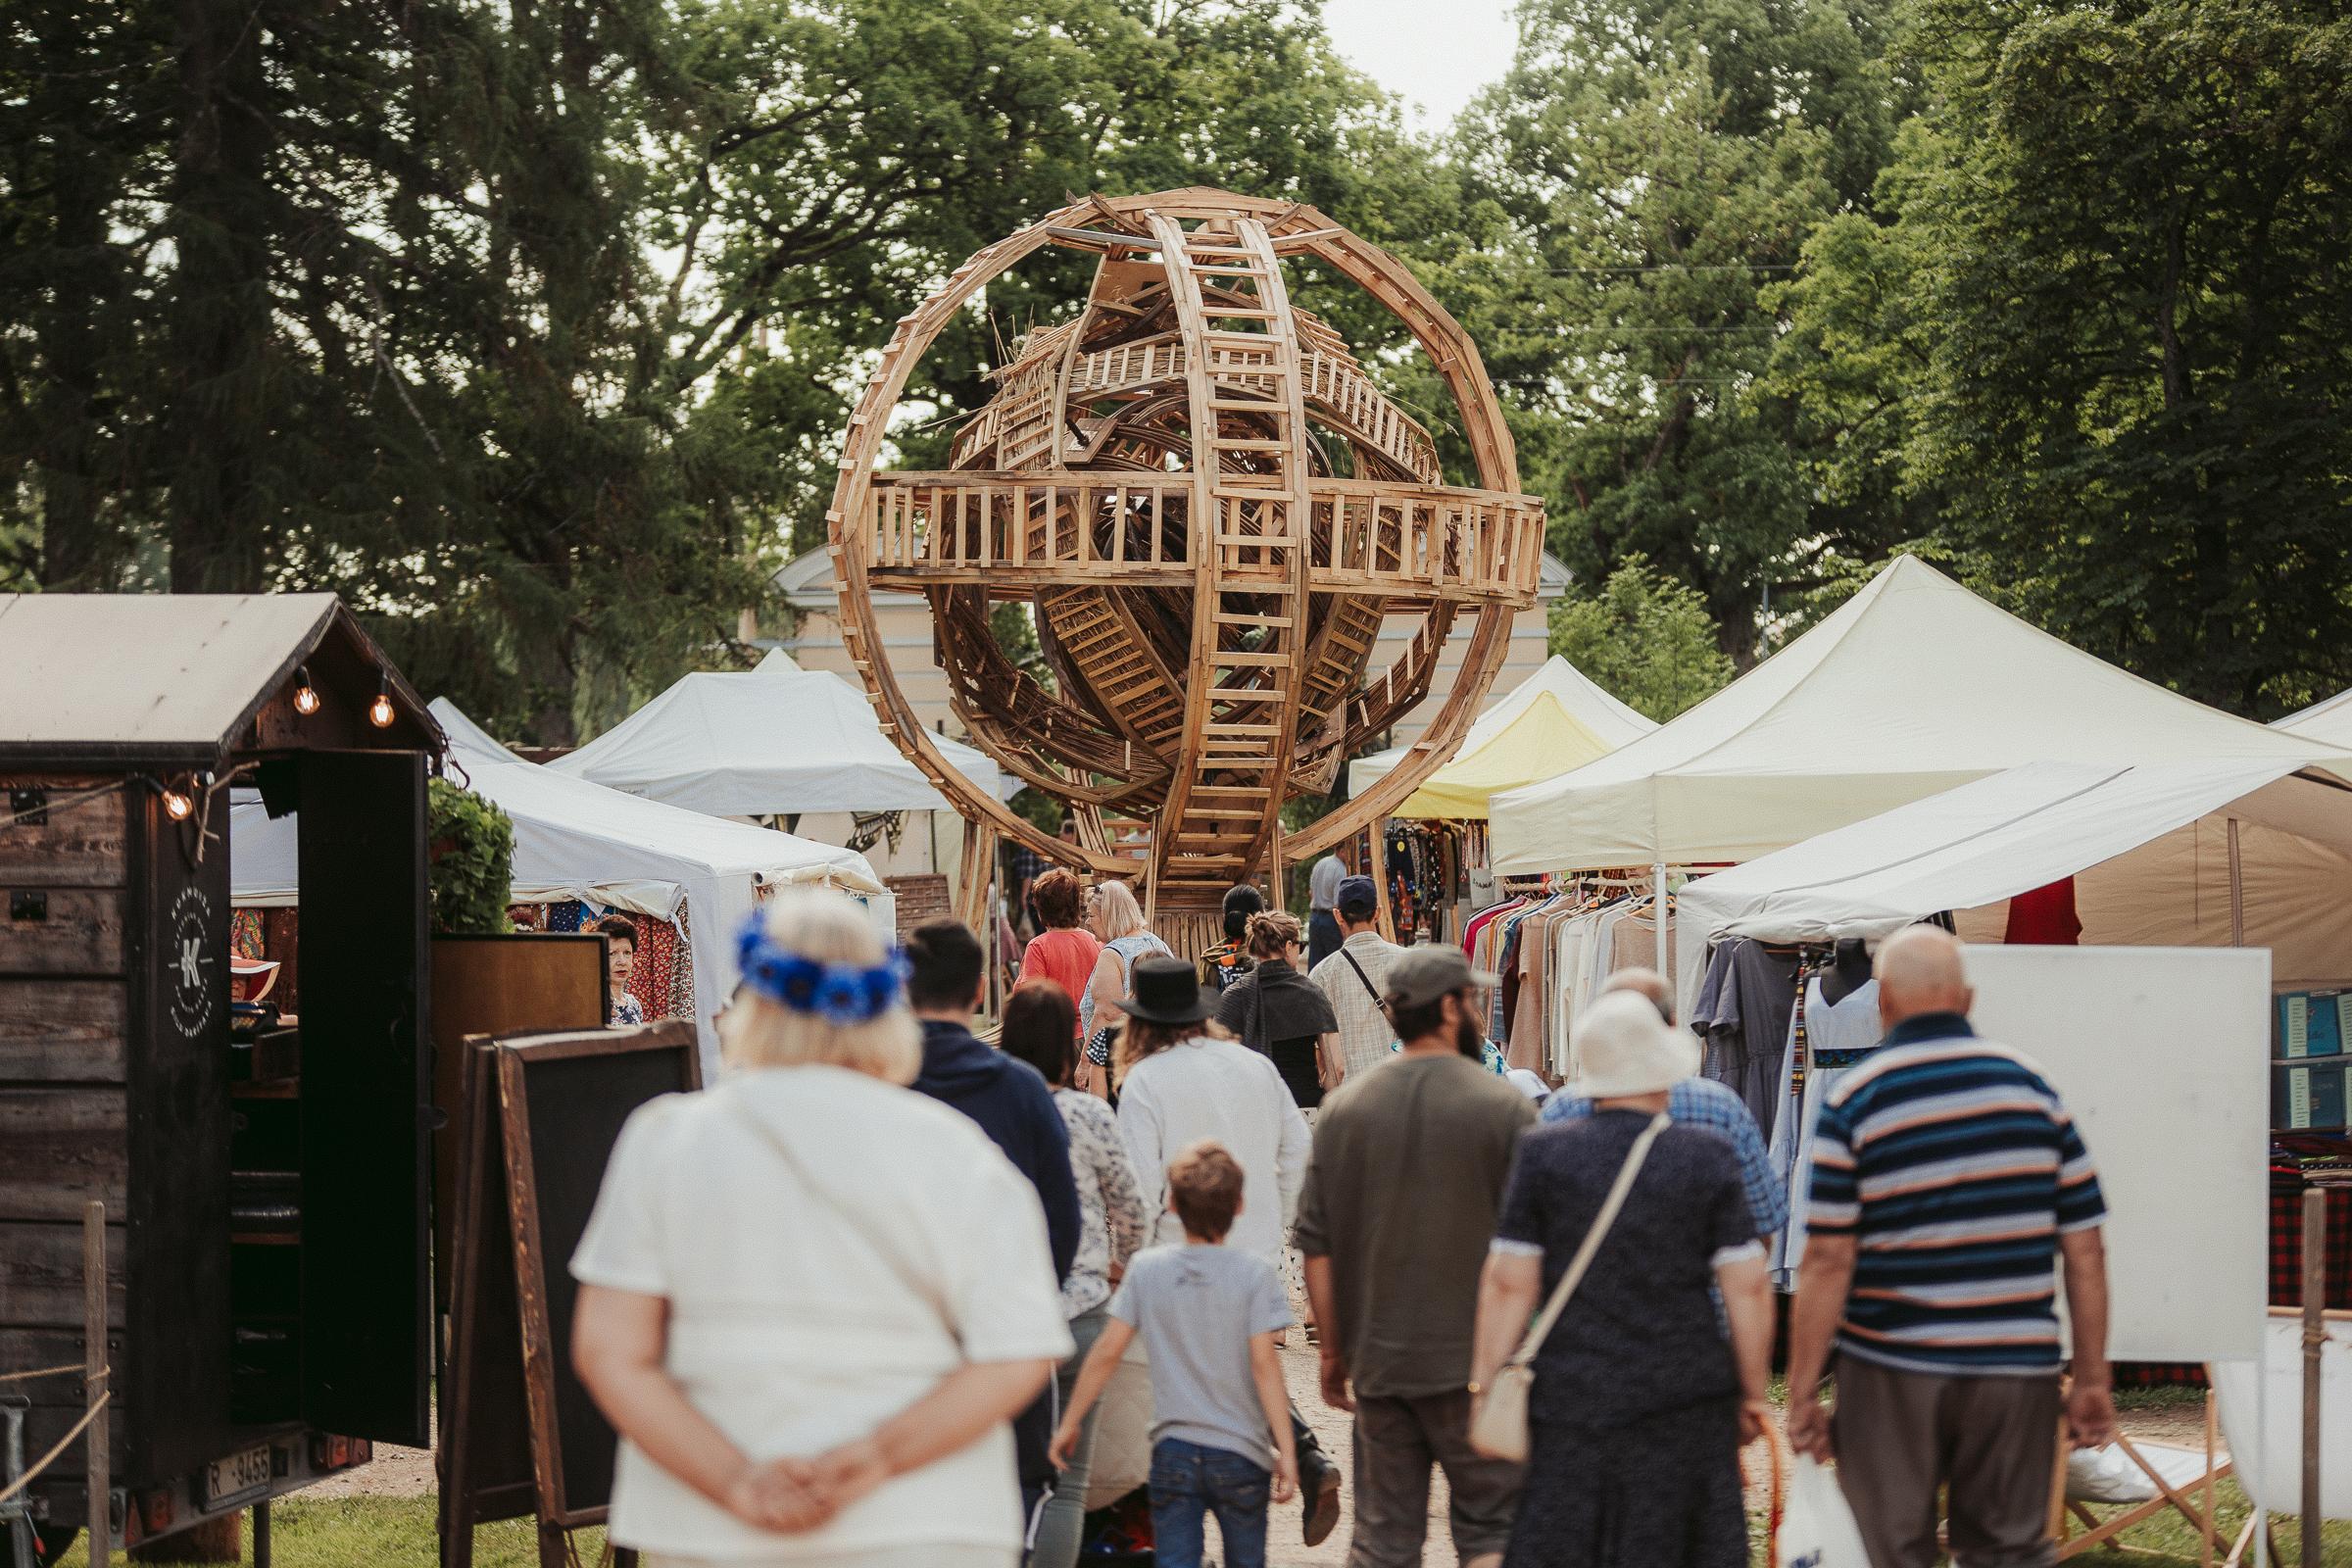 etnofestivals-sviests (7).jpg